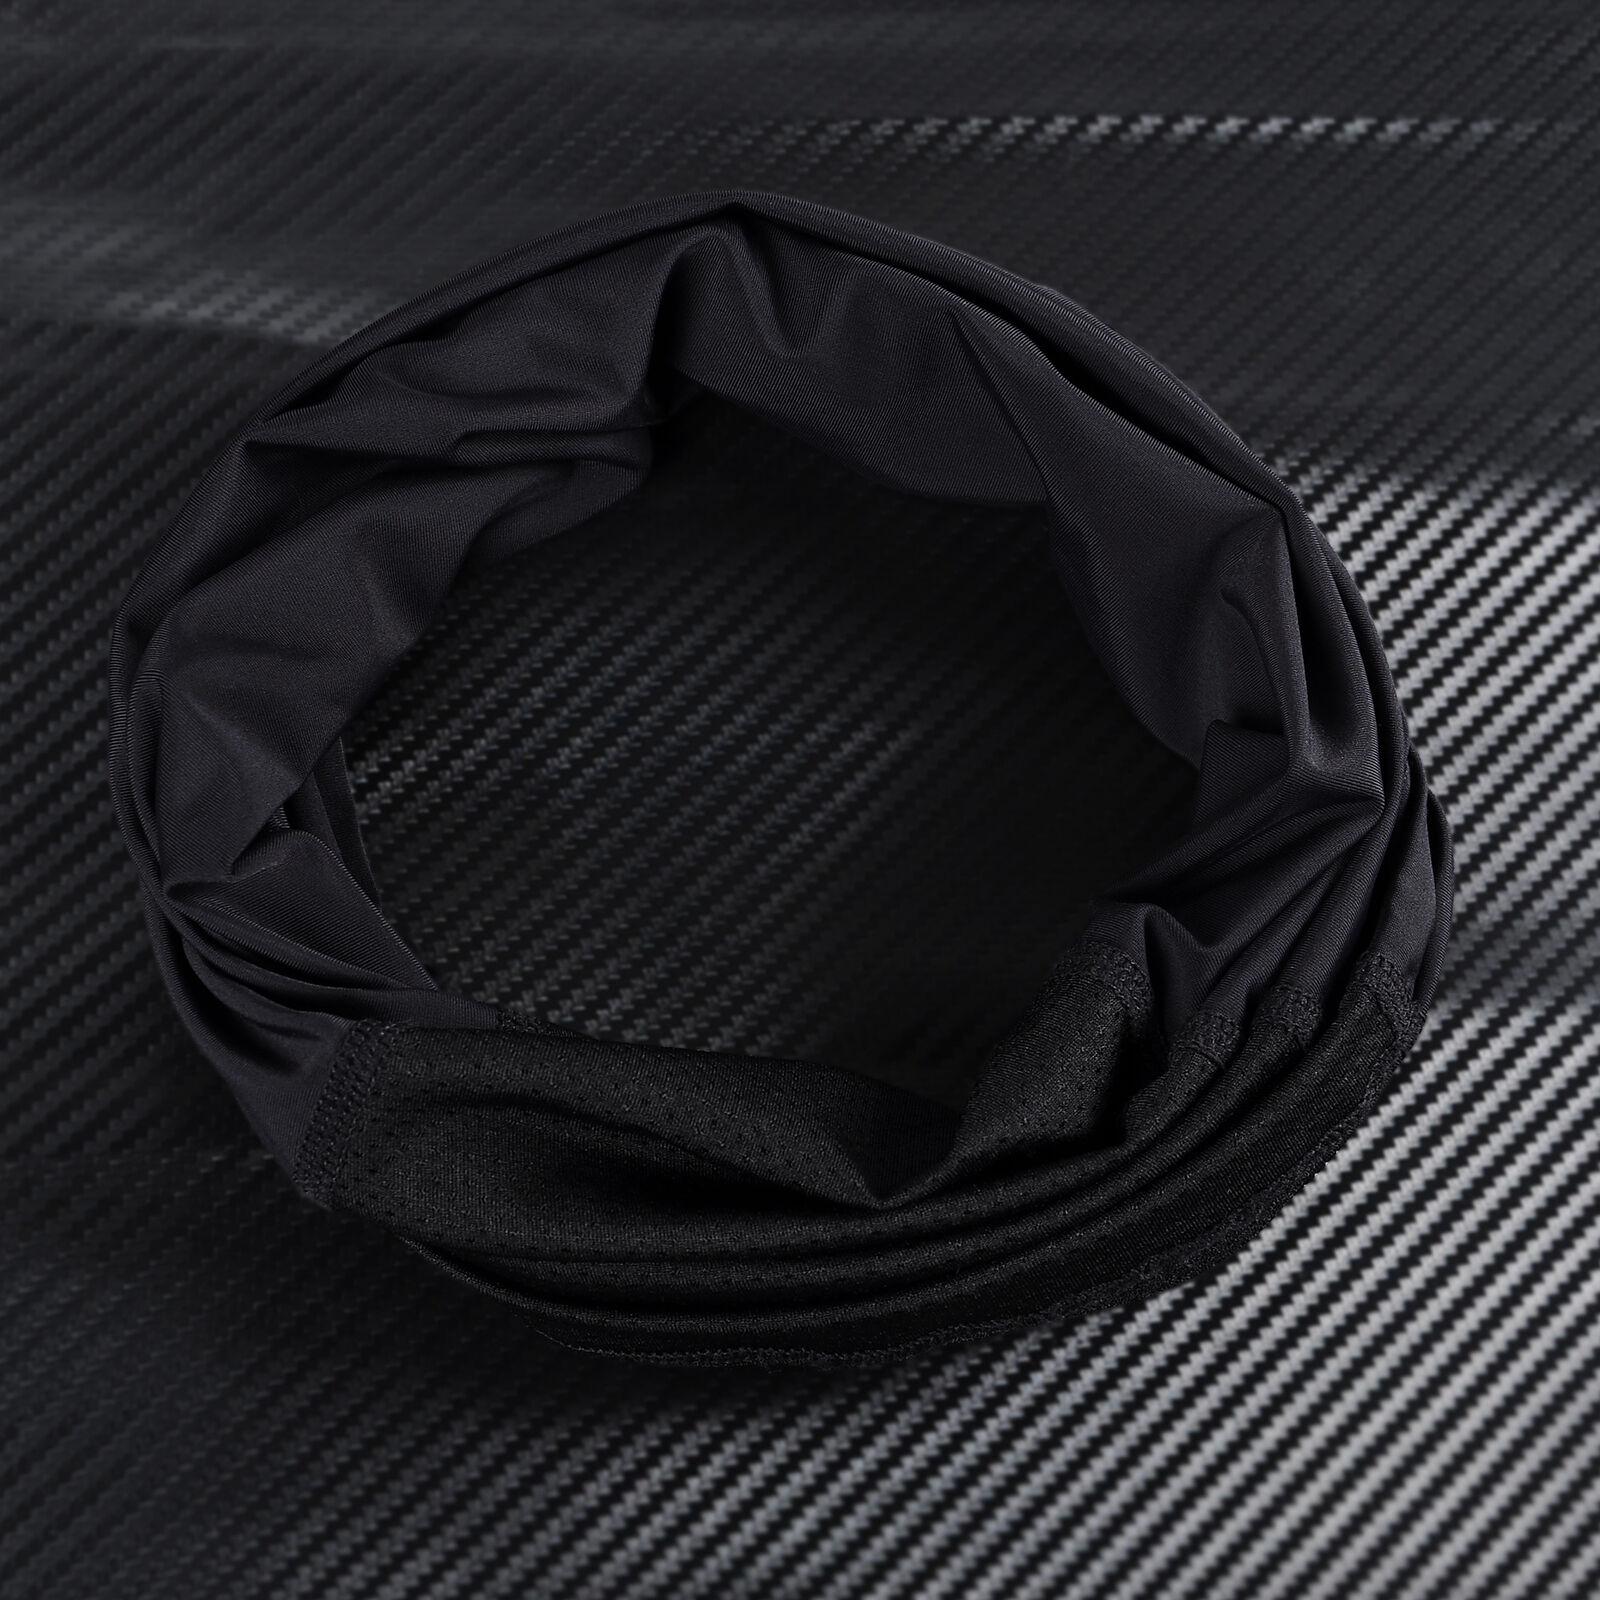 Summer Thin Breathable Drawstring Face Mask Neck Gaiter Tube Scarf Bandana US Clothing, Shoes & Accessories